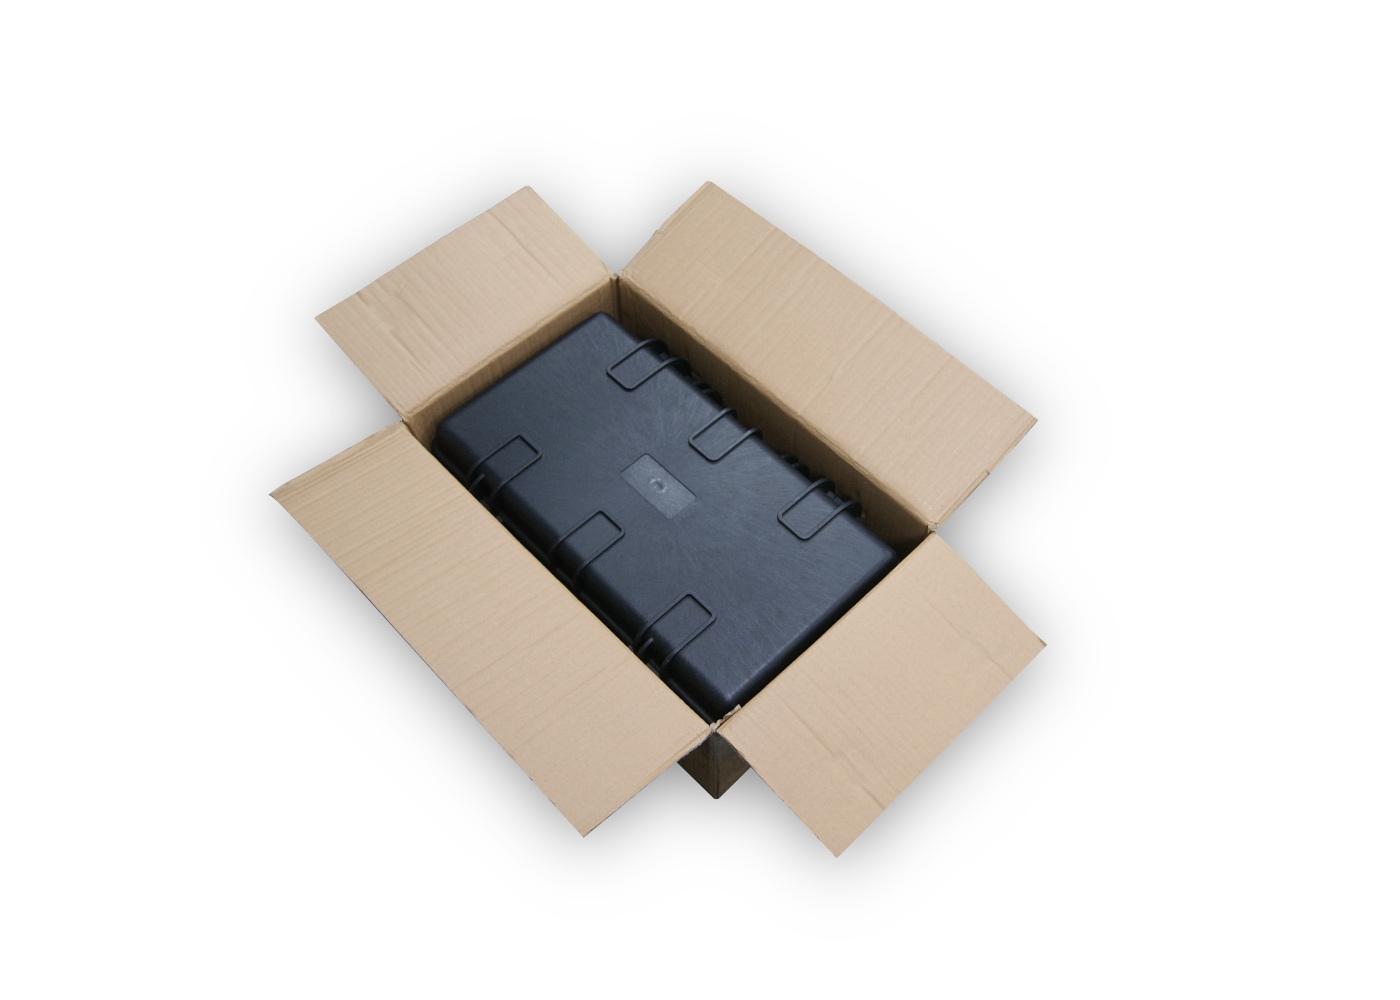 Упаковка для ЭЛ-01